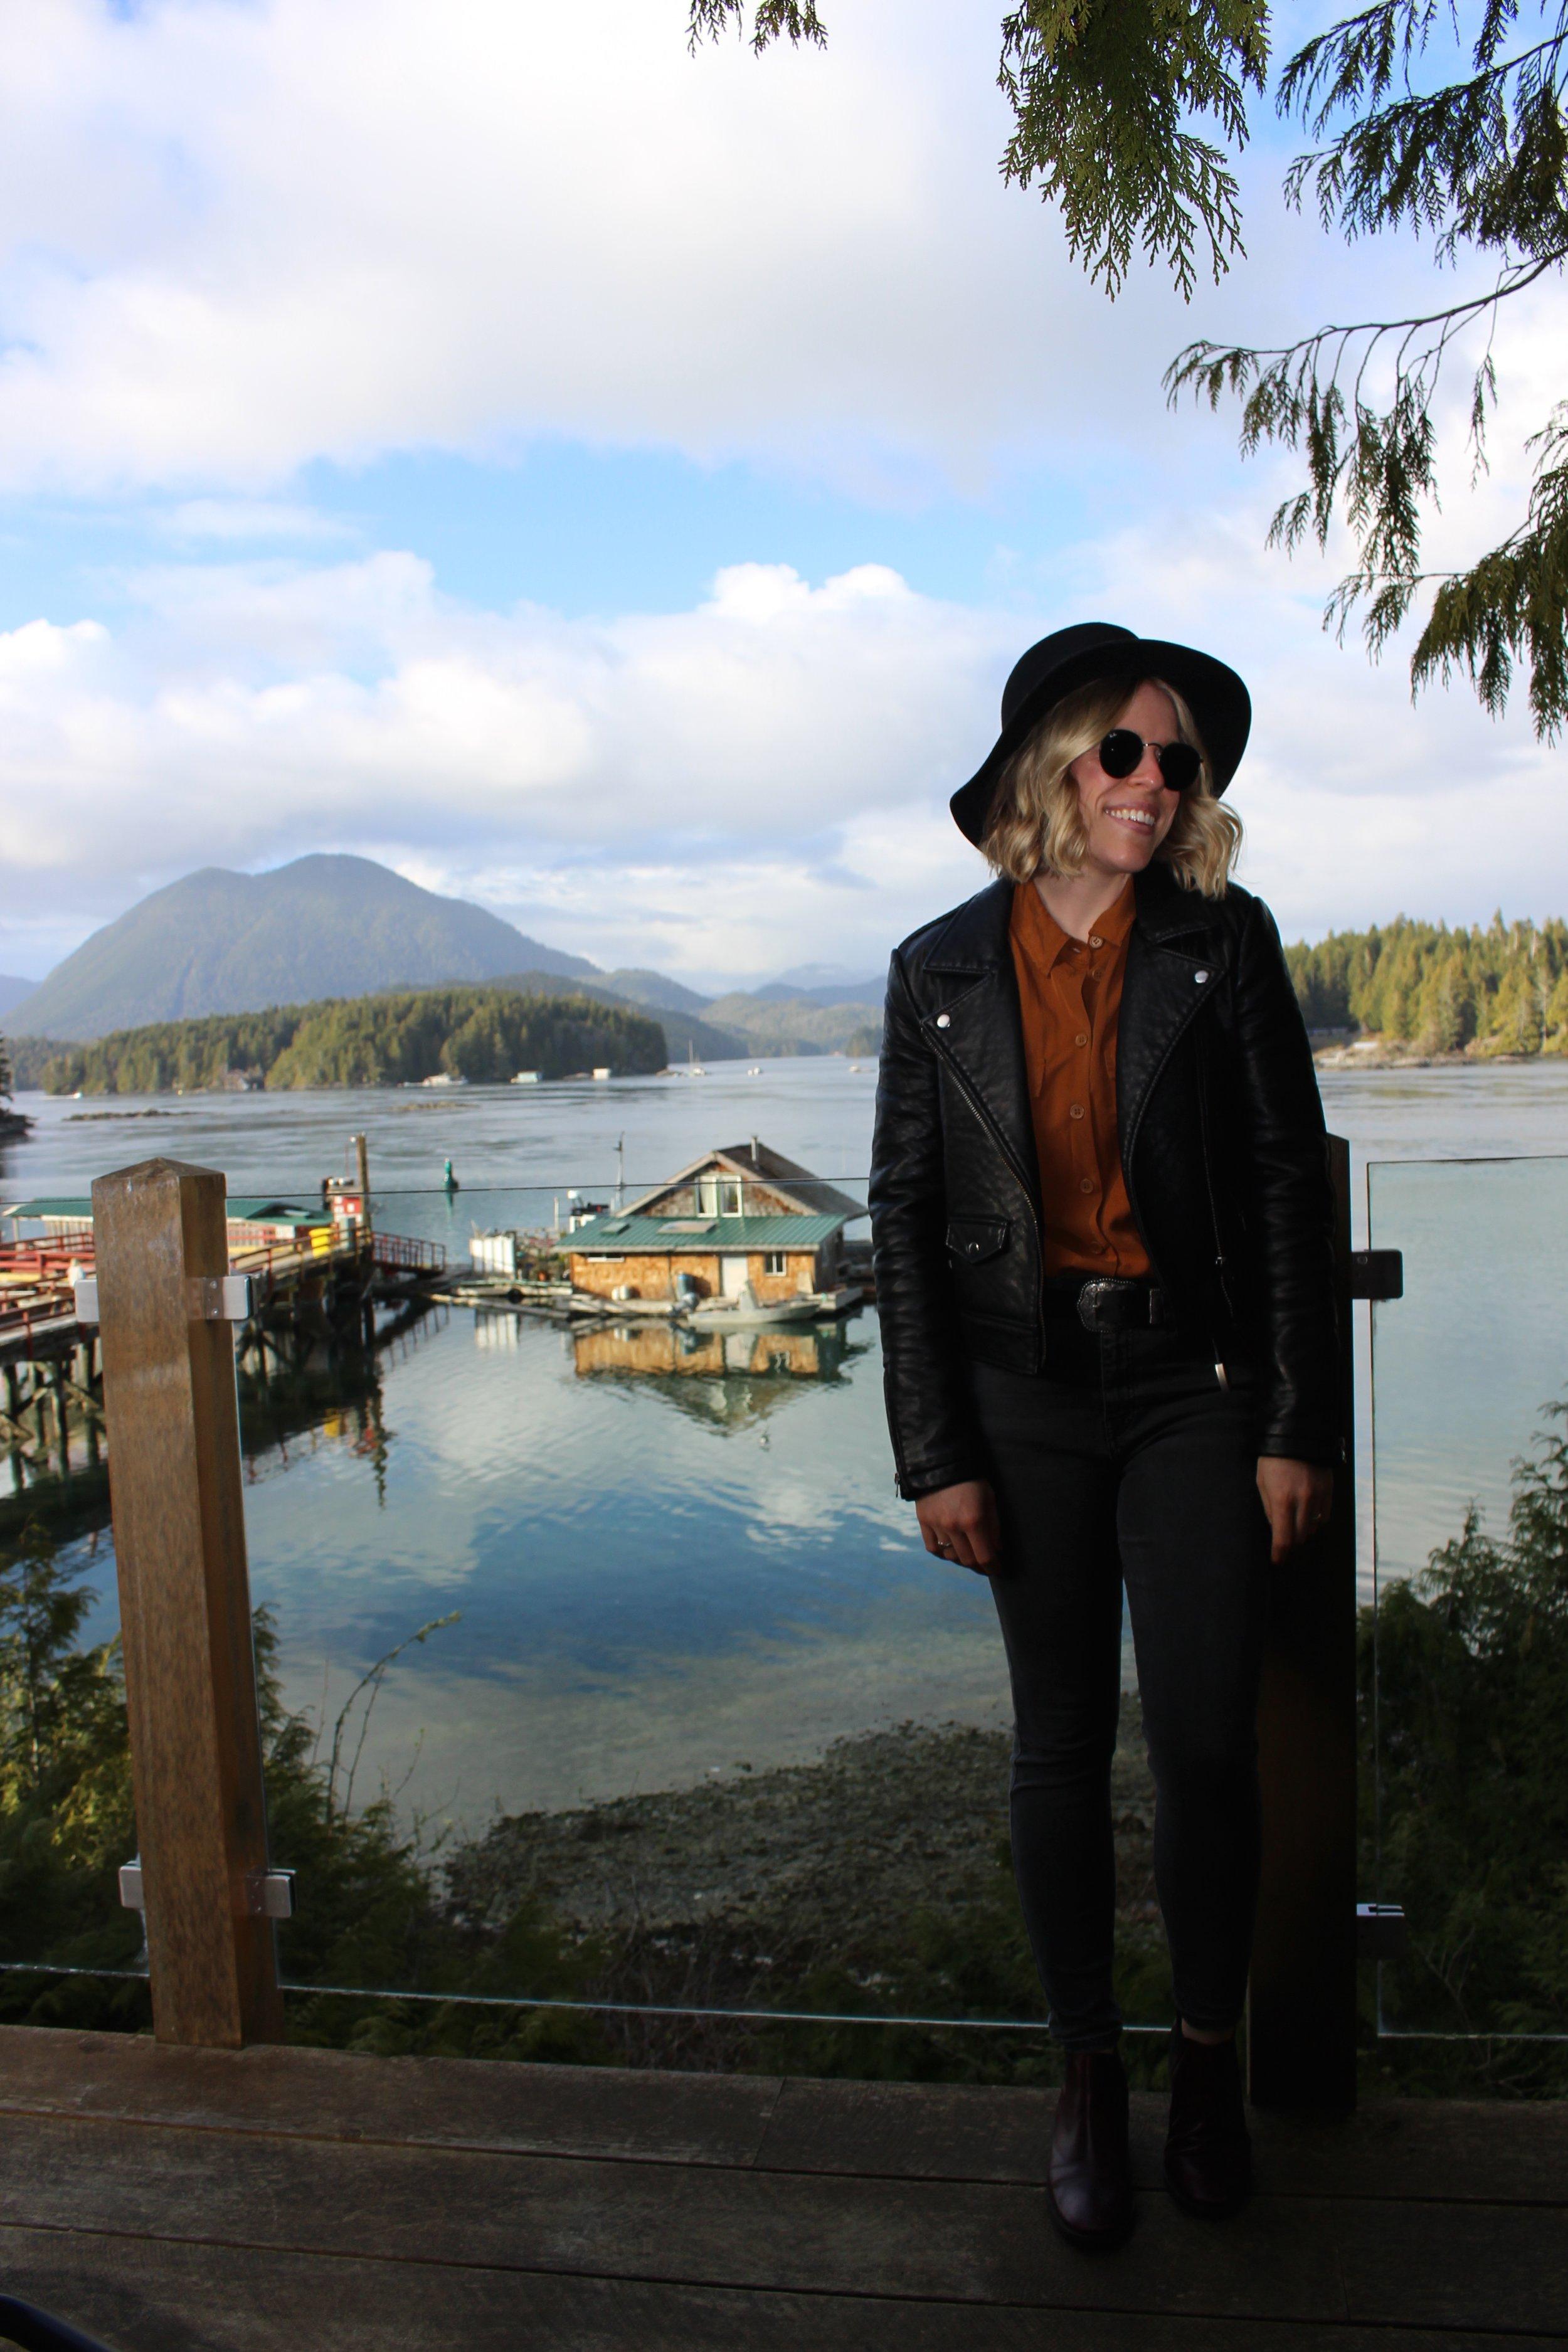 Wearing Wool Hat from Kelowna,    Topshop        Leather Jacket,    Topshop    Blouse,    Topshop    Jeans,    Topshop    Booties,    Topshop    Belt, Ray Ban Sunglasses